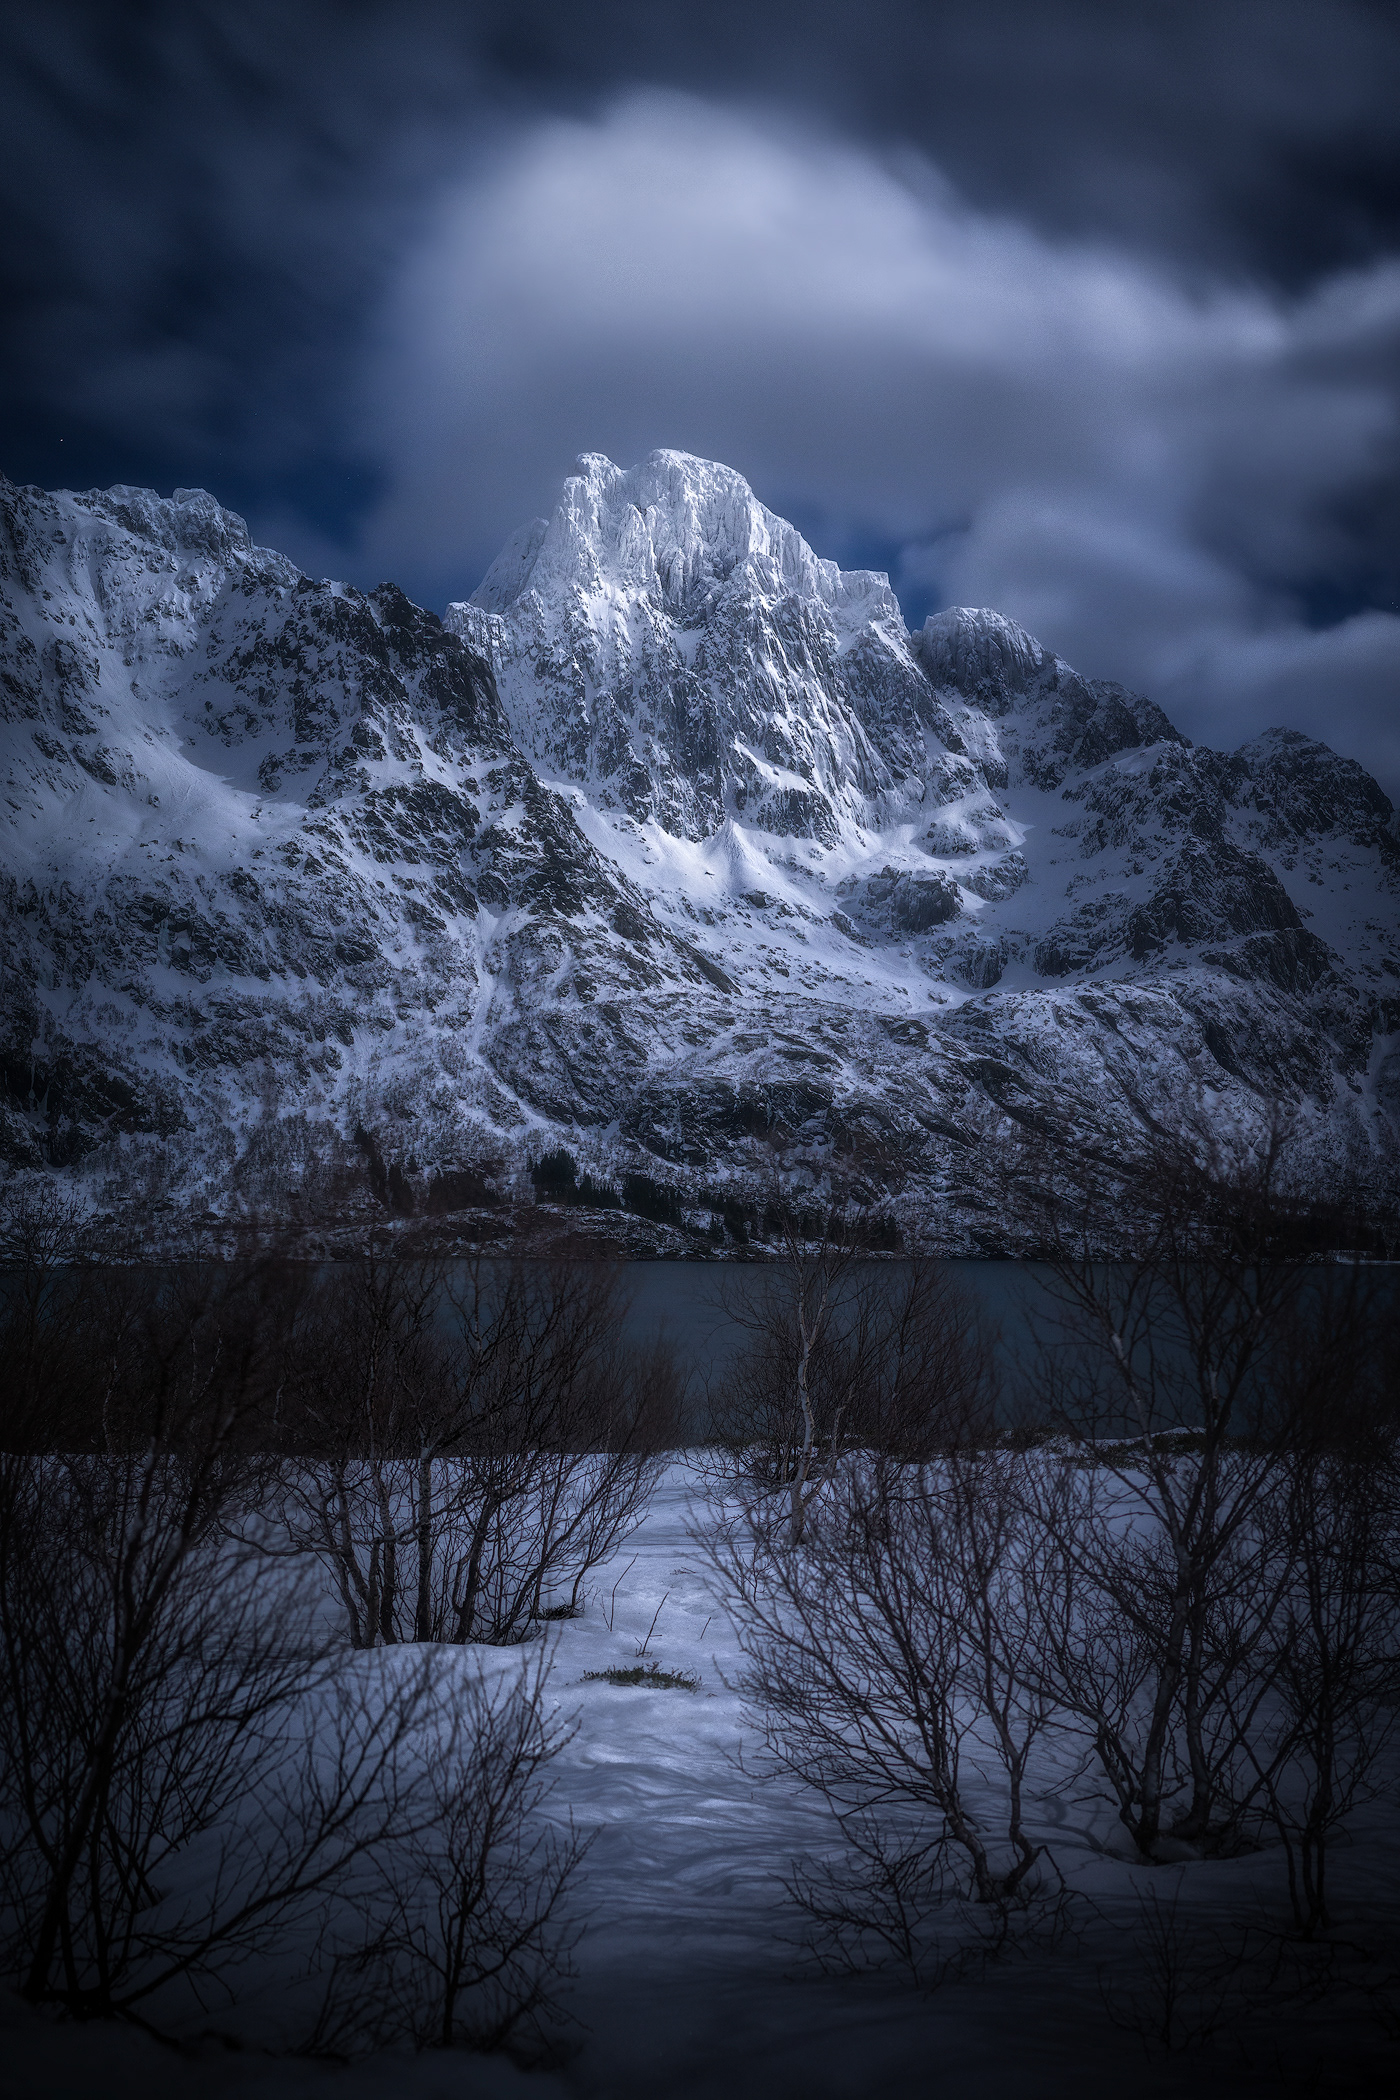 alps Landscape landscape photography moon Moonscapes nature photography night night photography Photography